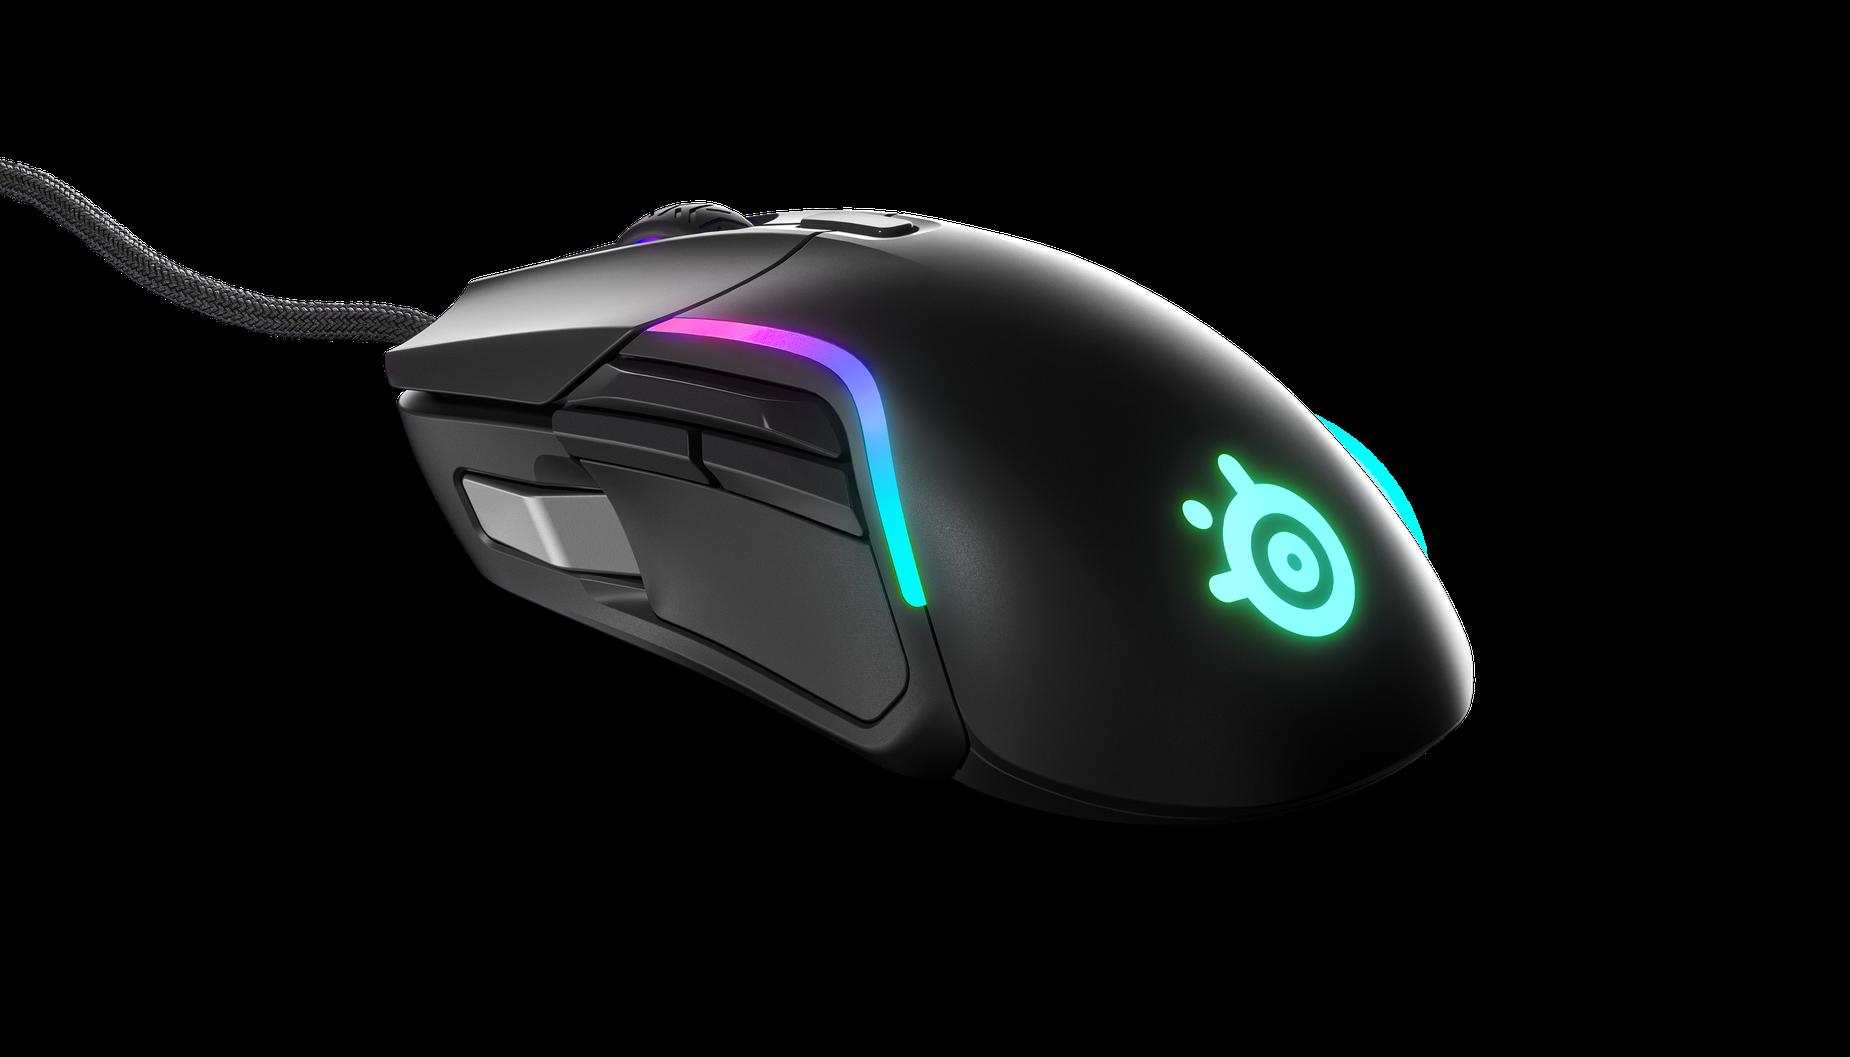 Rival 5 遊戲滑鼠顯示 RBG 燈效的功能與位置。